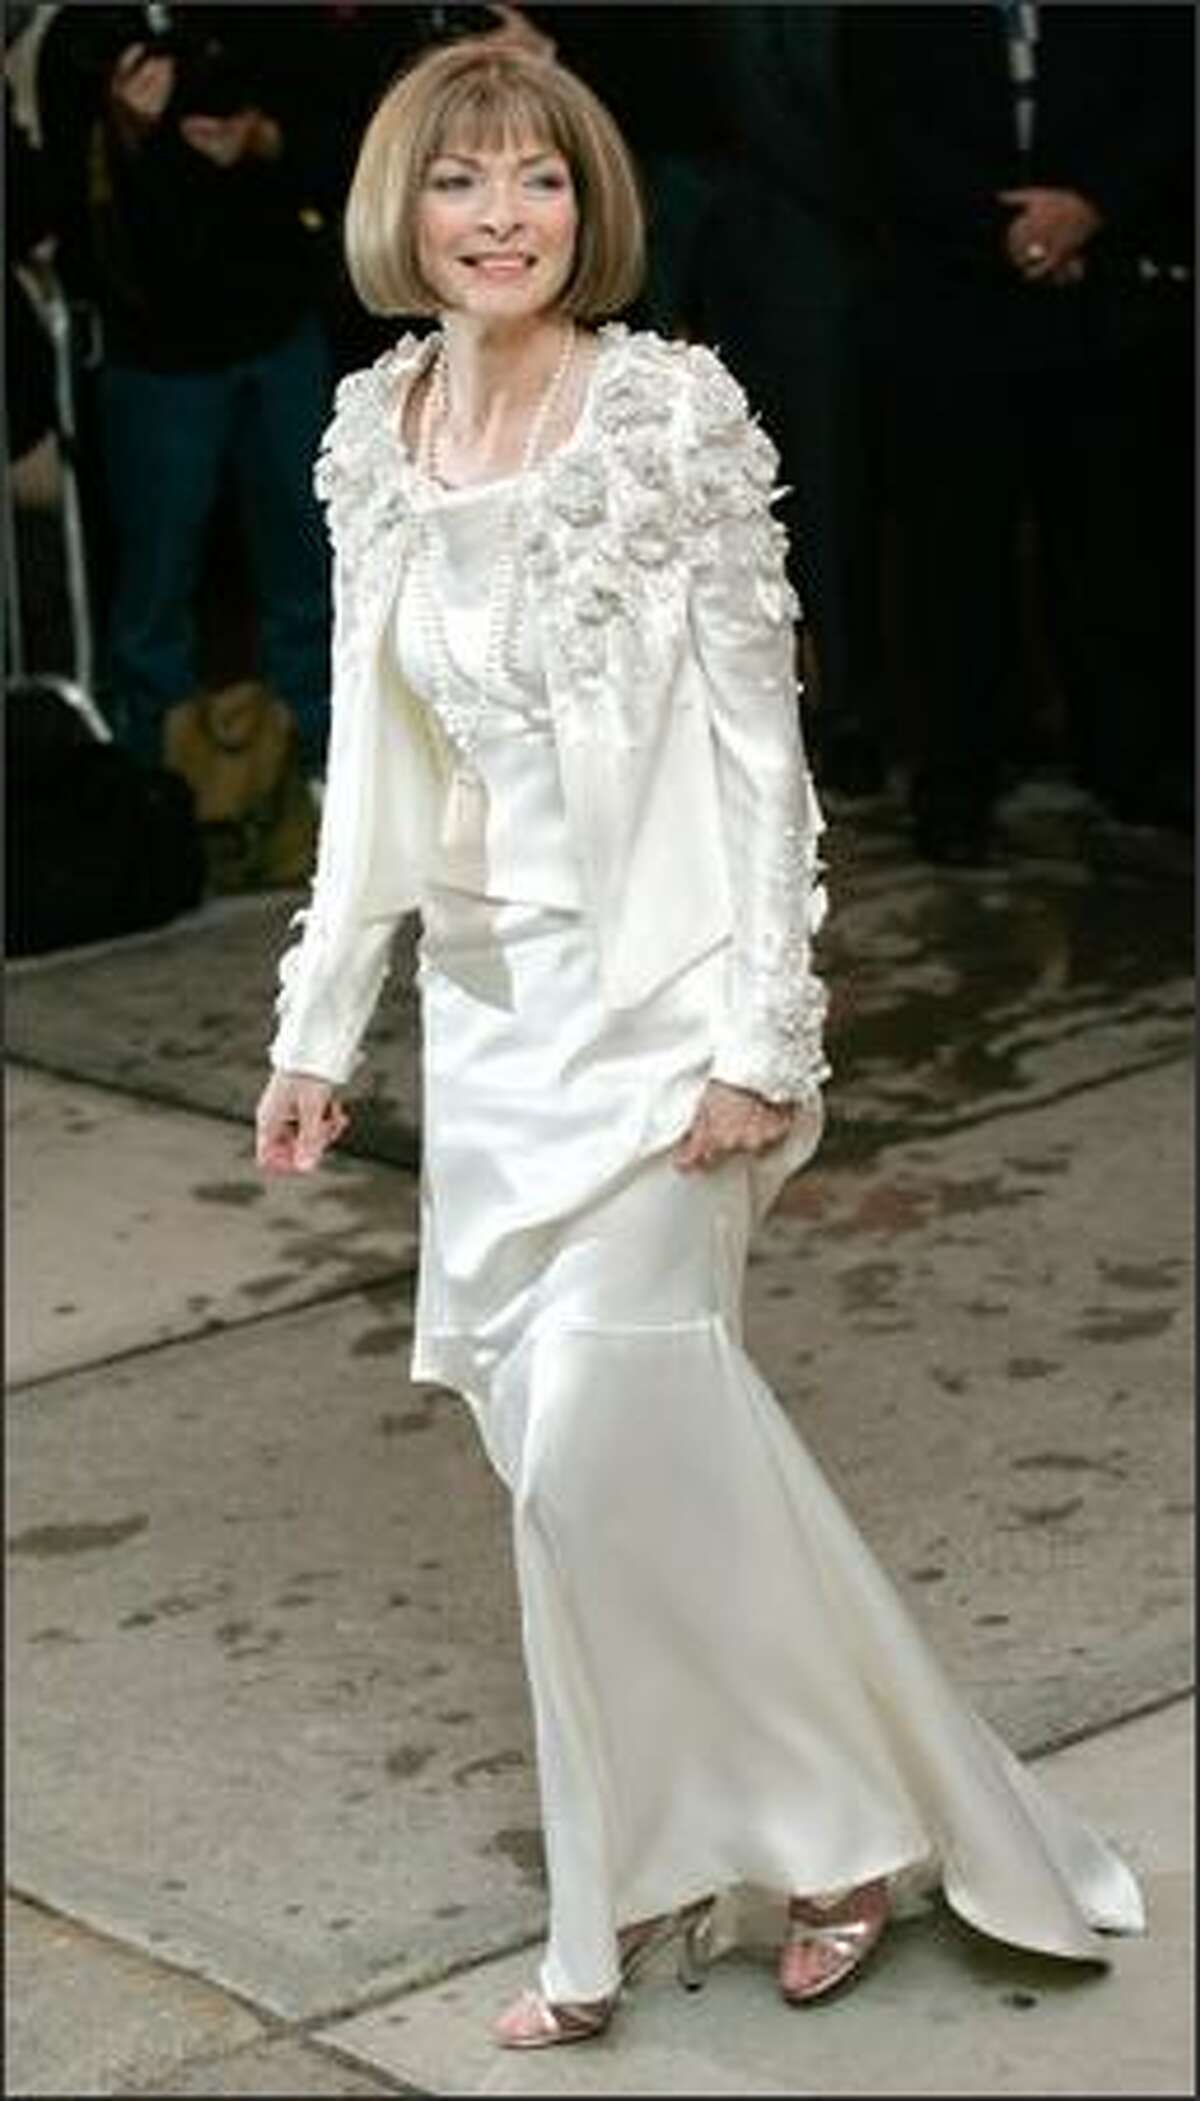 Anna Wintour arrives at the Costume Institute Gala held at the Metropolitan Museum of Art in New York. (AP Photo/Stuart Ramson)